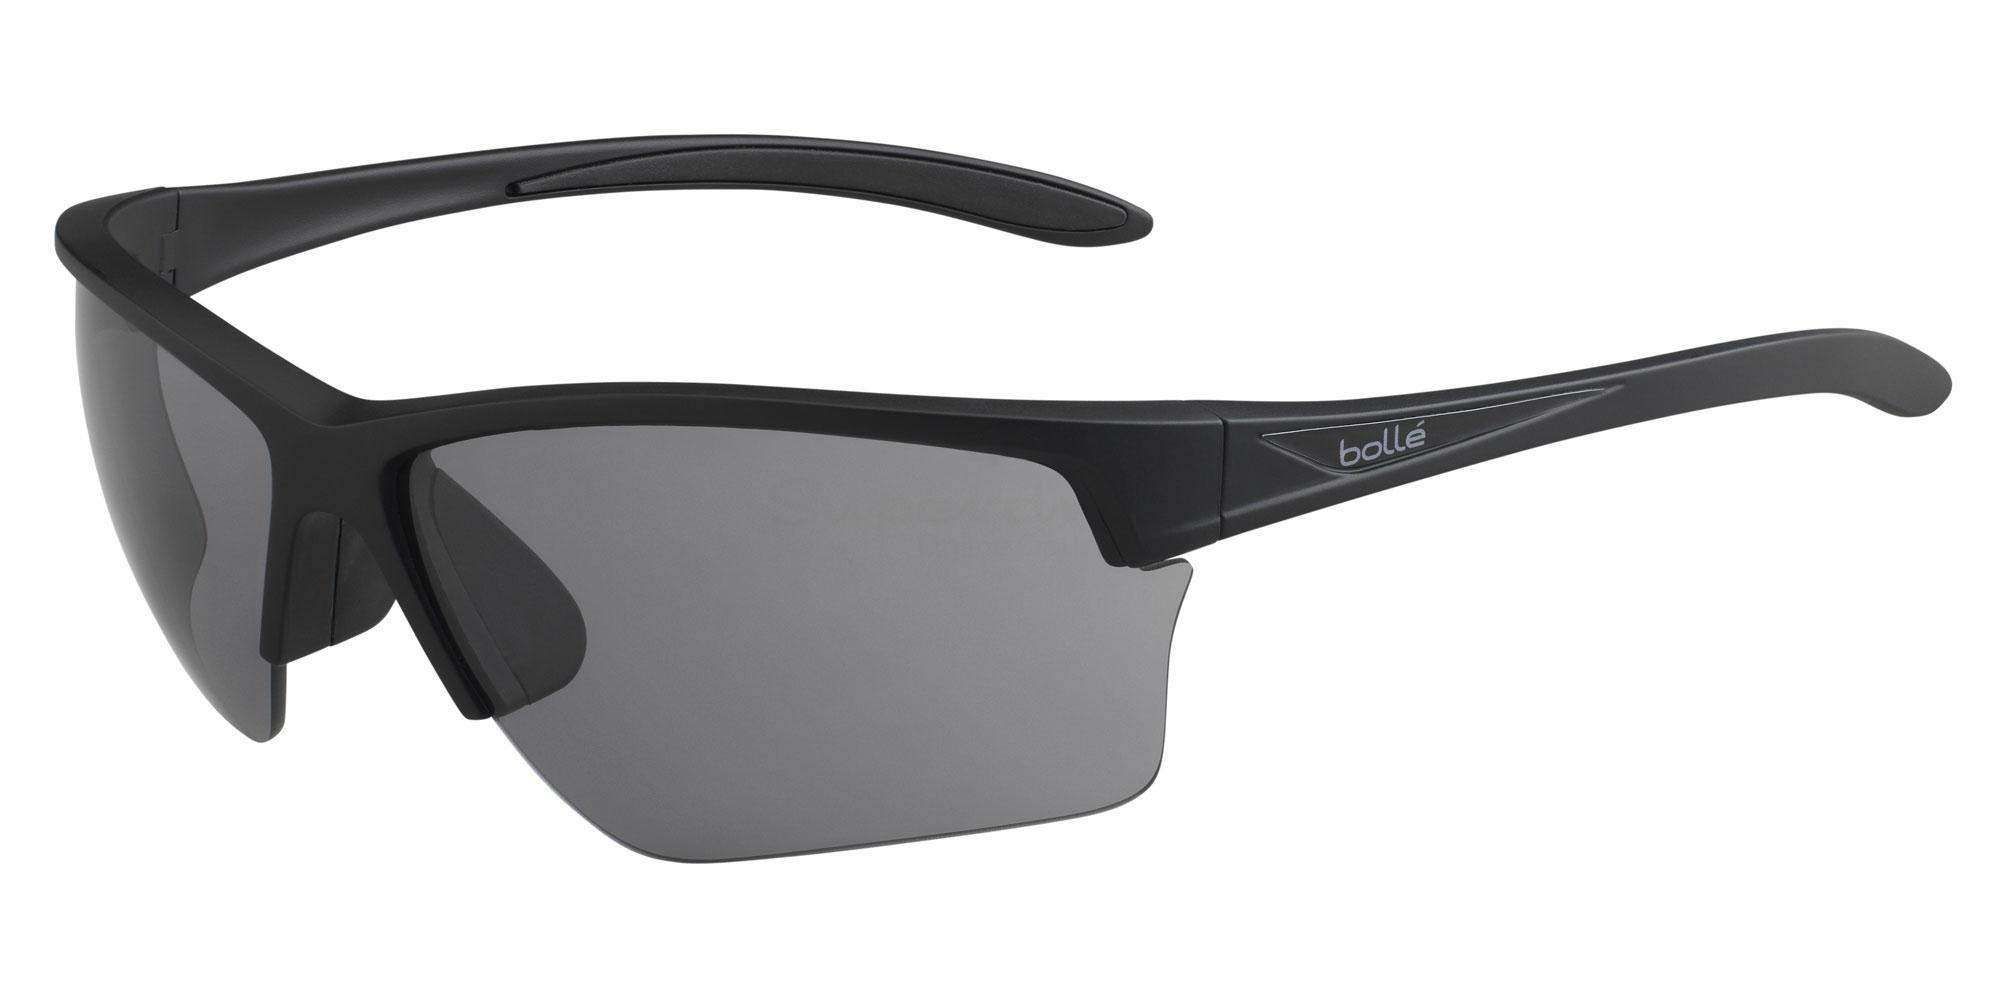 12205 Flash Sunglasses, Bolle